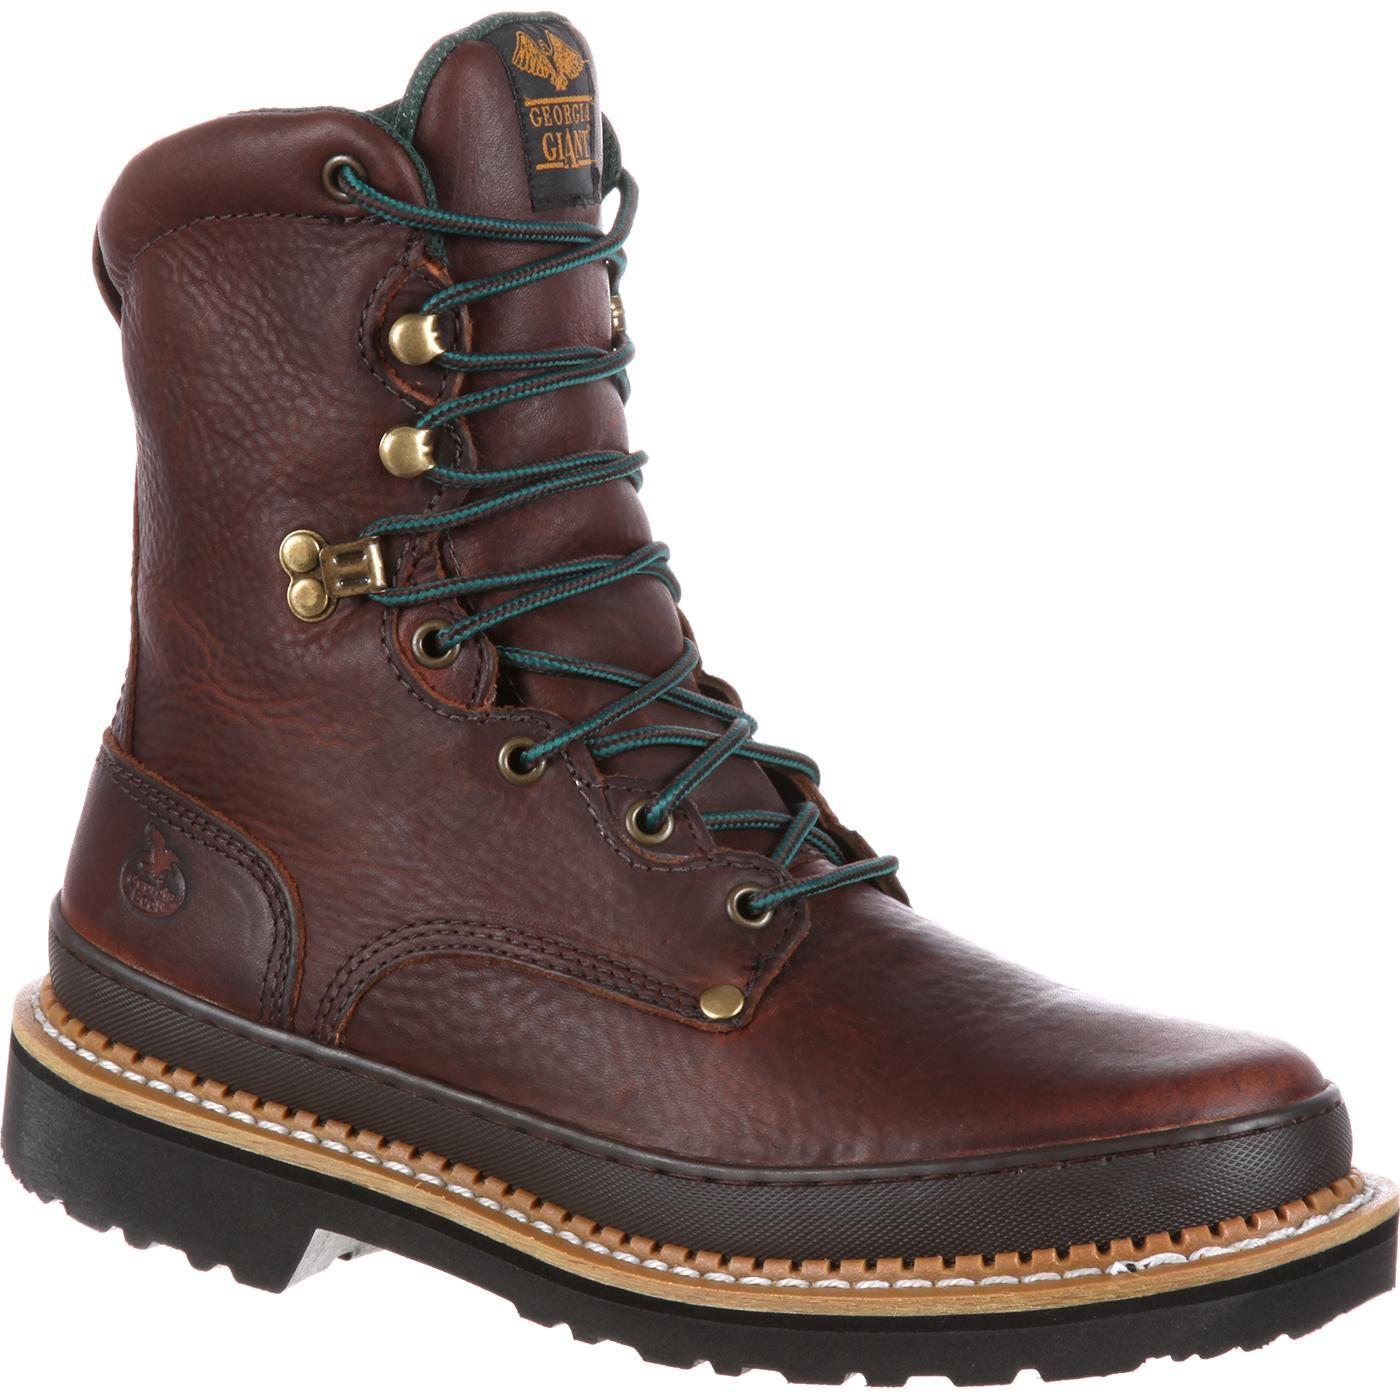 Georgia Giant Men's Steel Toe Work Boots, #G8374